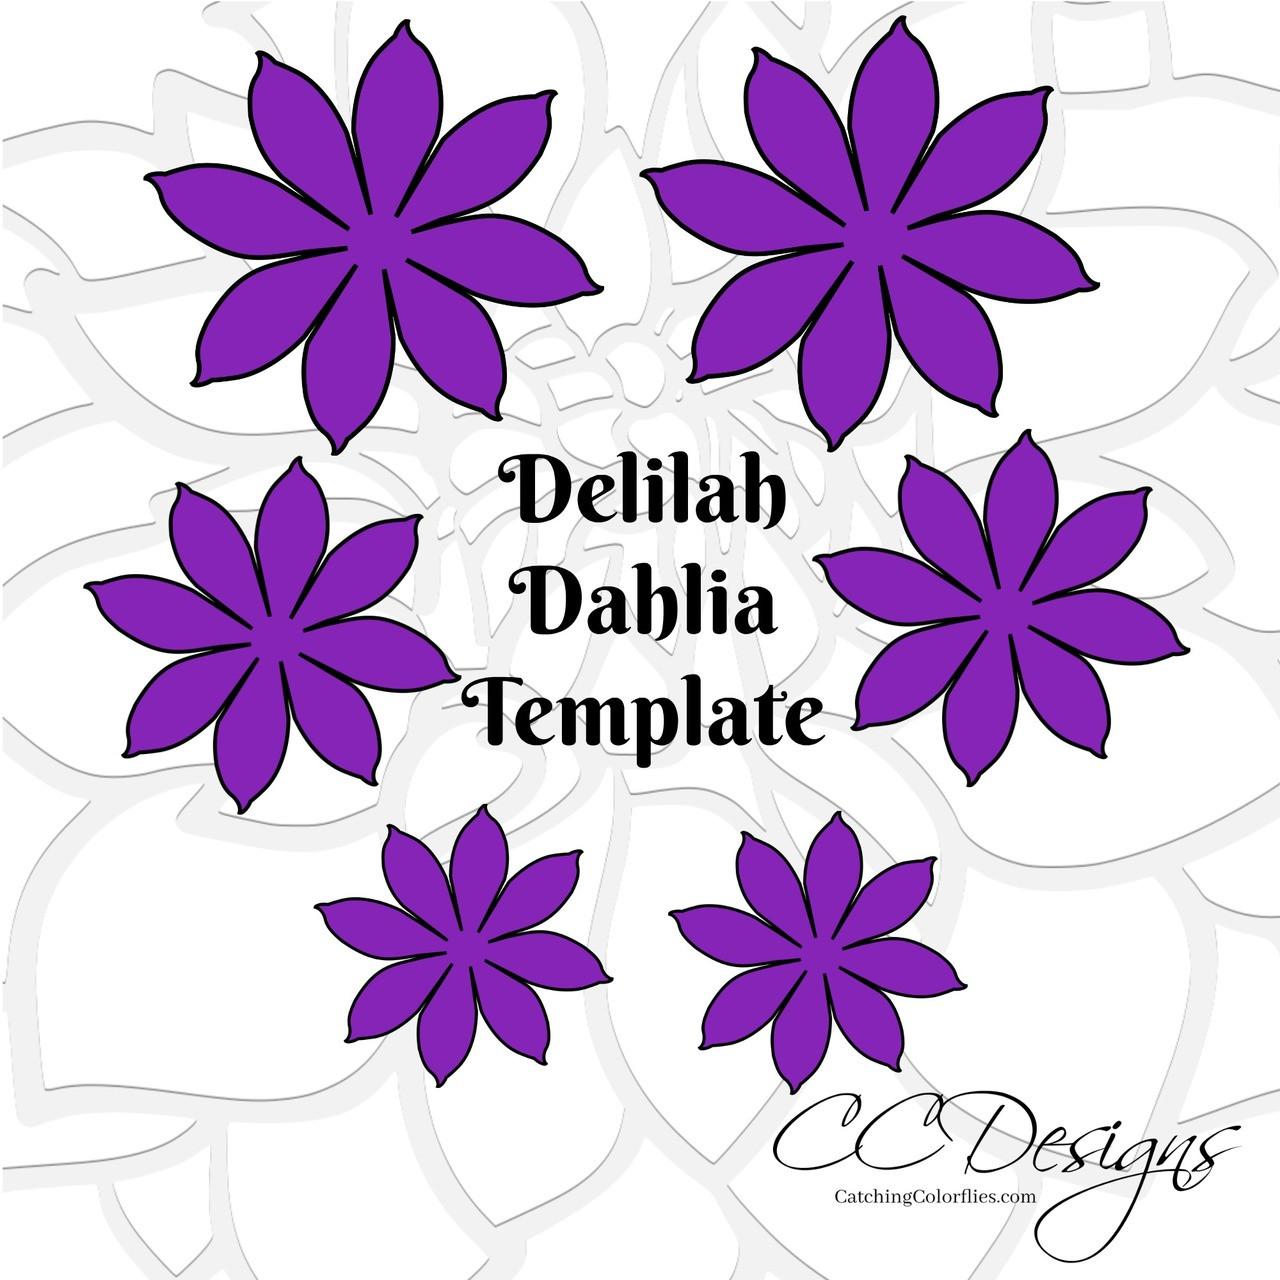 Delilah Dahlia Style Paper Flower Template